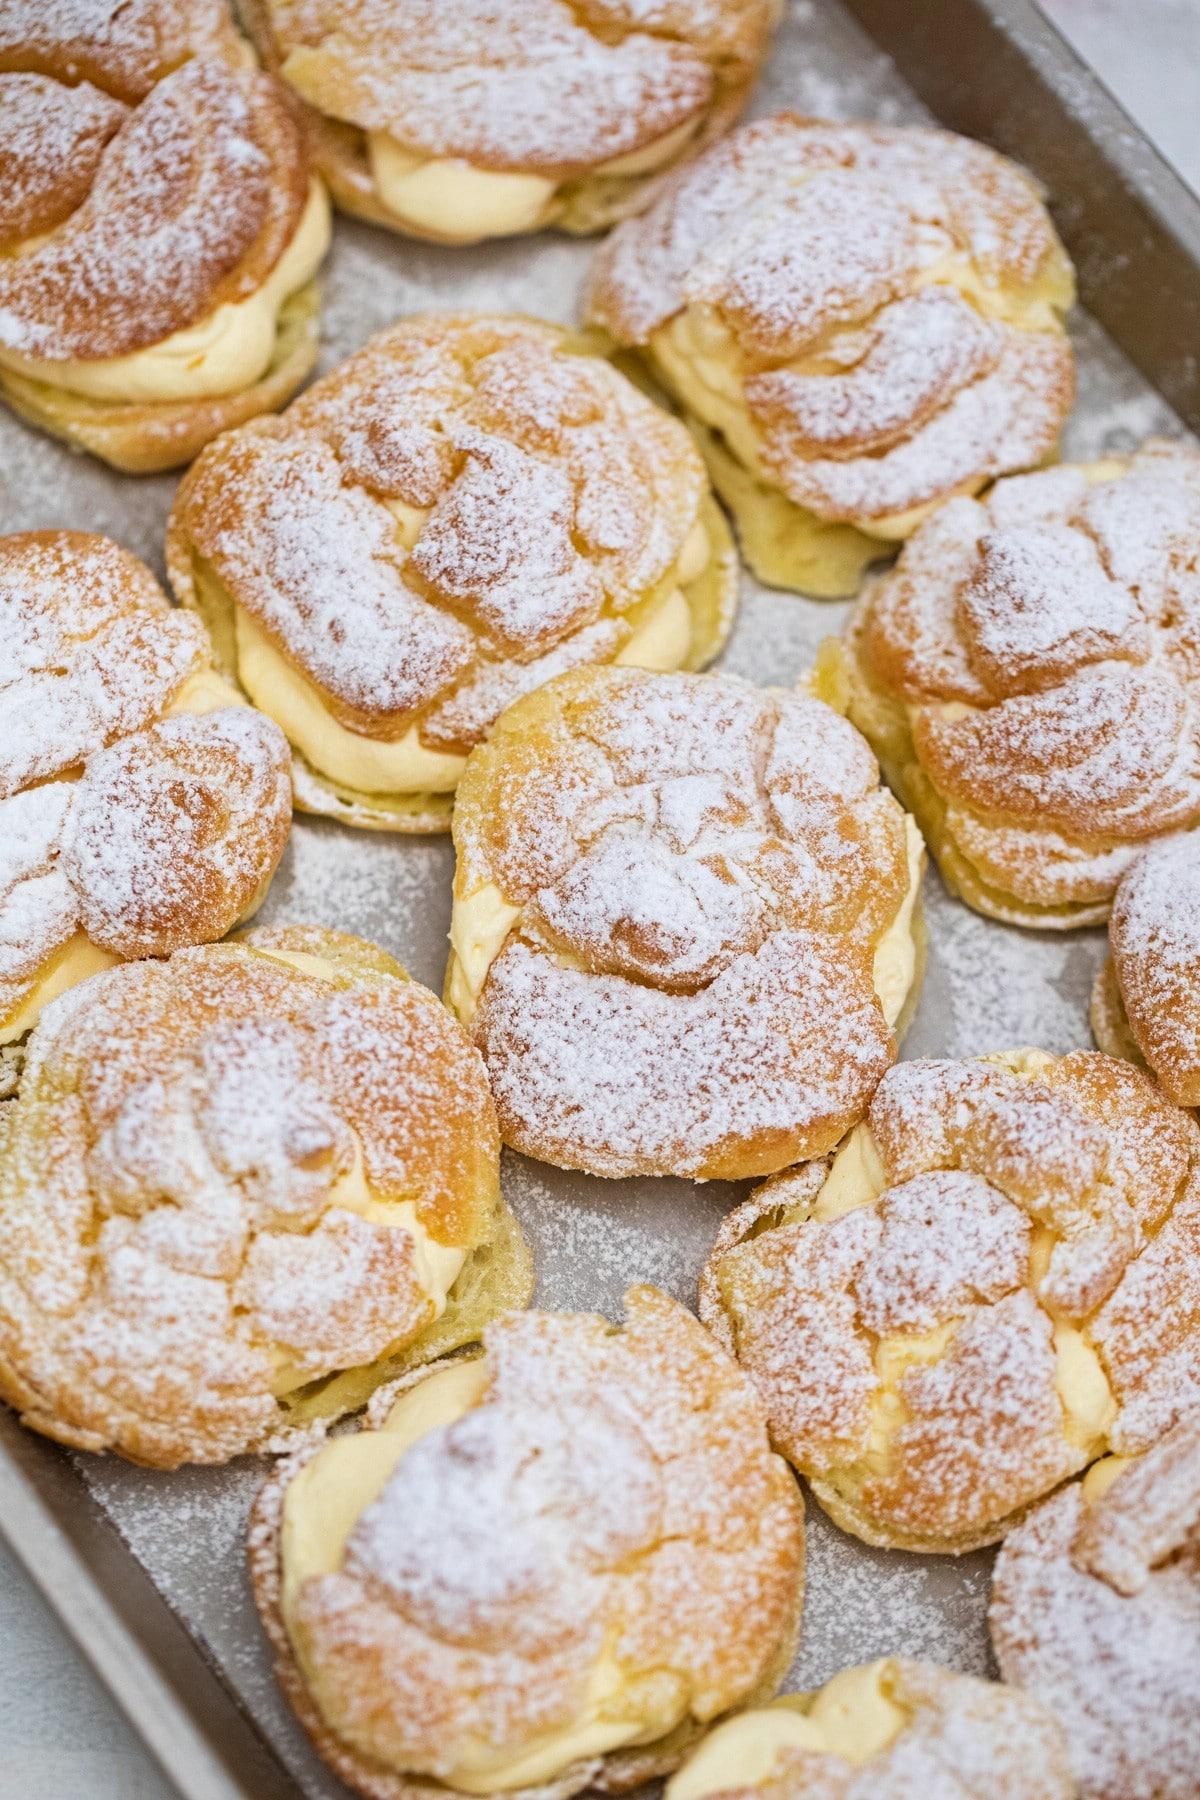 Cream puffs on baking sheet